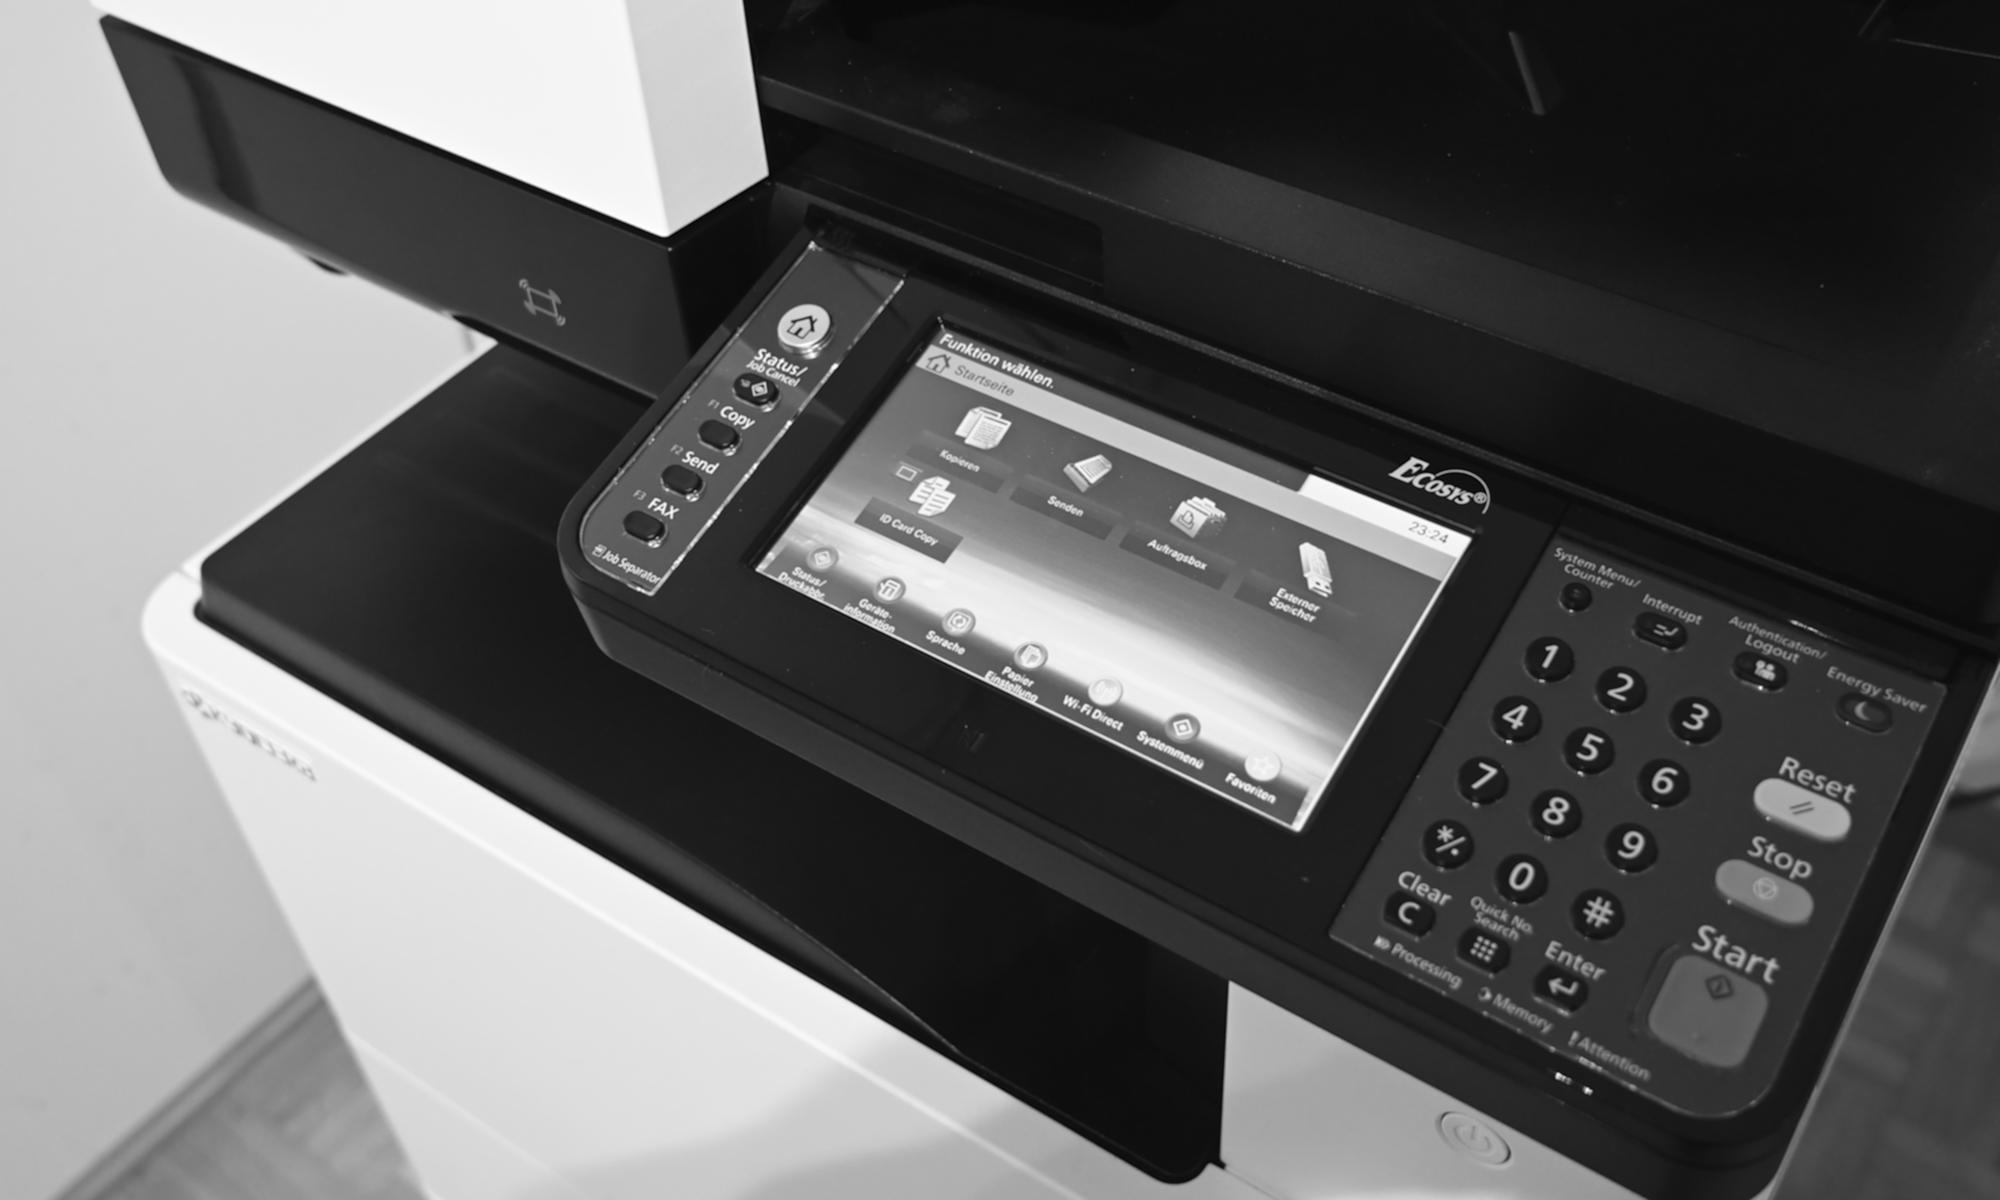 Girard Computer Technology GmbH